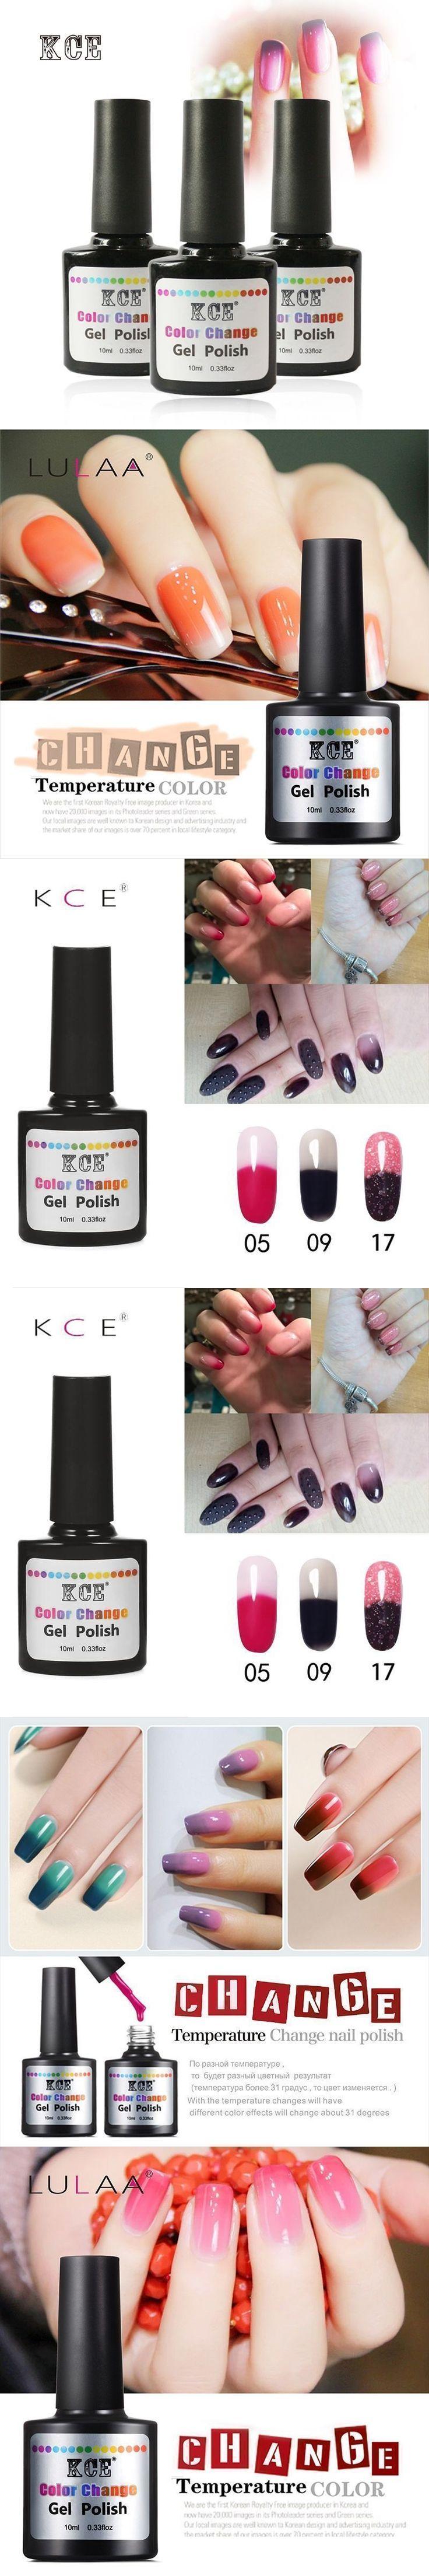 LULAA 7.5 ML Temperature Chameleon Nail Gel Polish Thermal Color Change UV GeL Nail Soak Off Gel Nail Polish Changing Color #uvgelnails